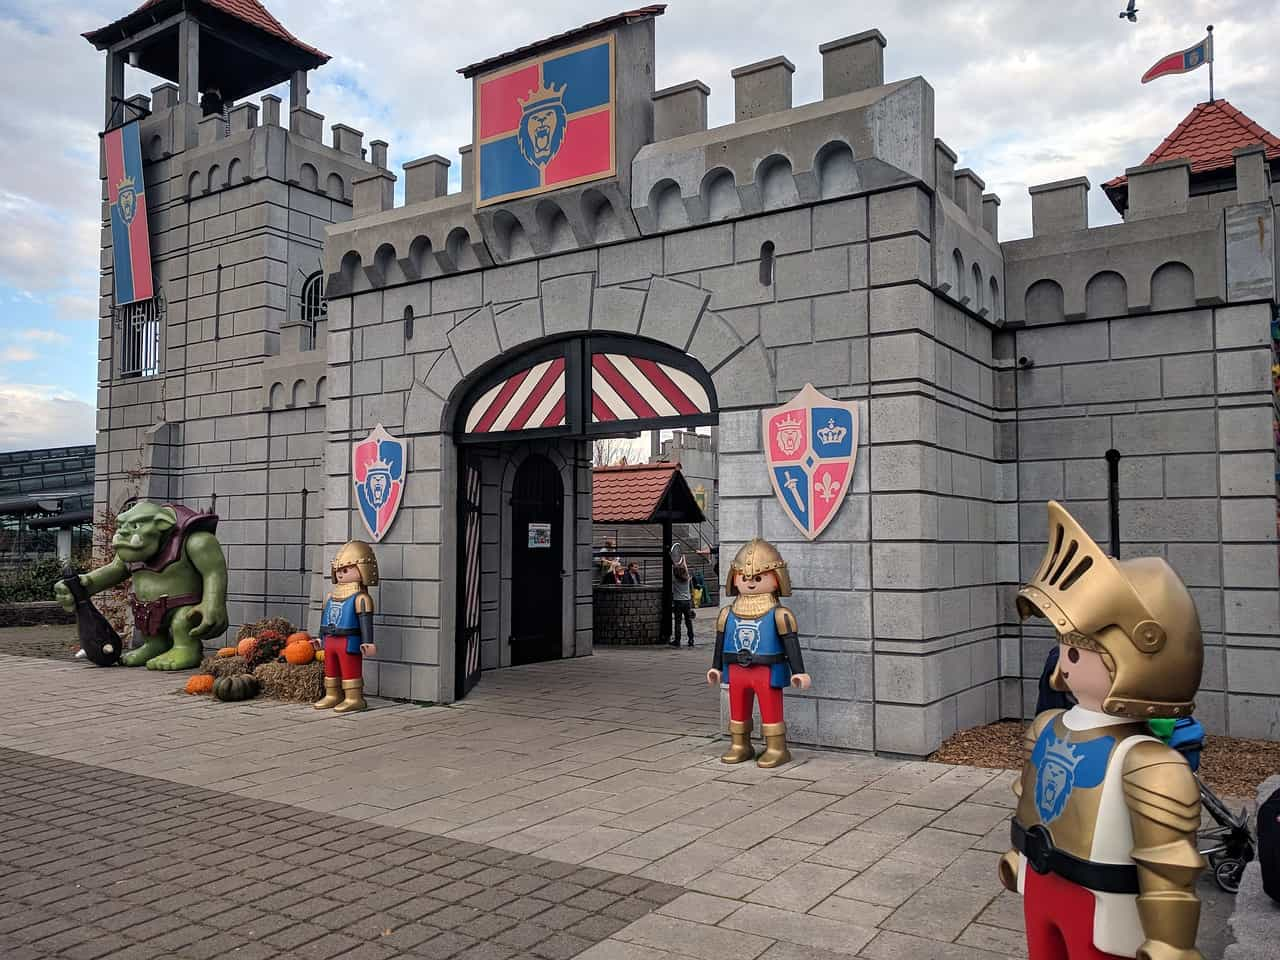 Zimdorf Playmobil Funpark nur 47,00€ - Ticket & Hotel